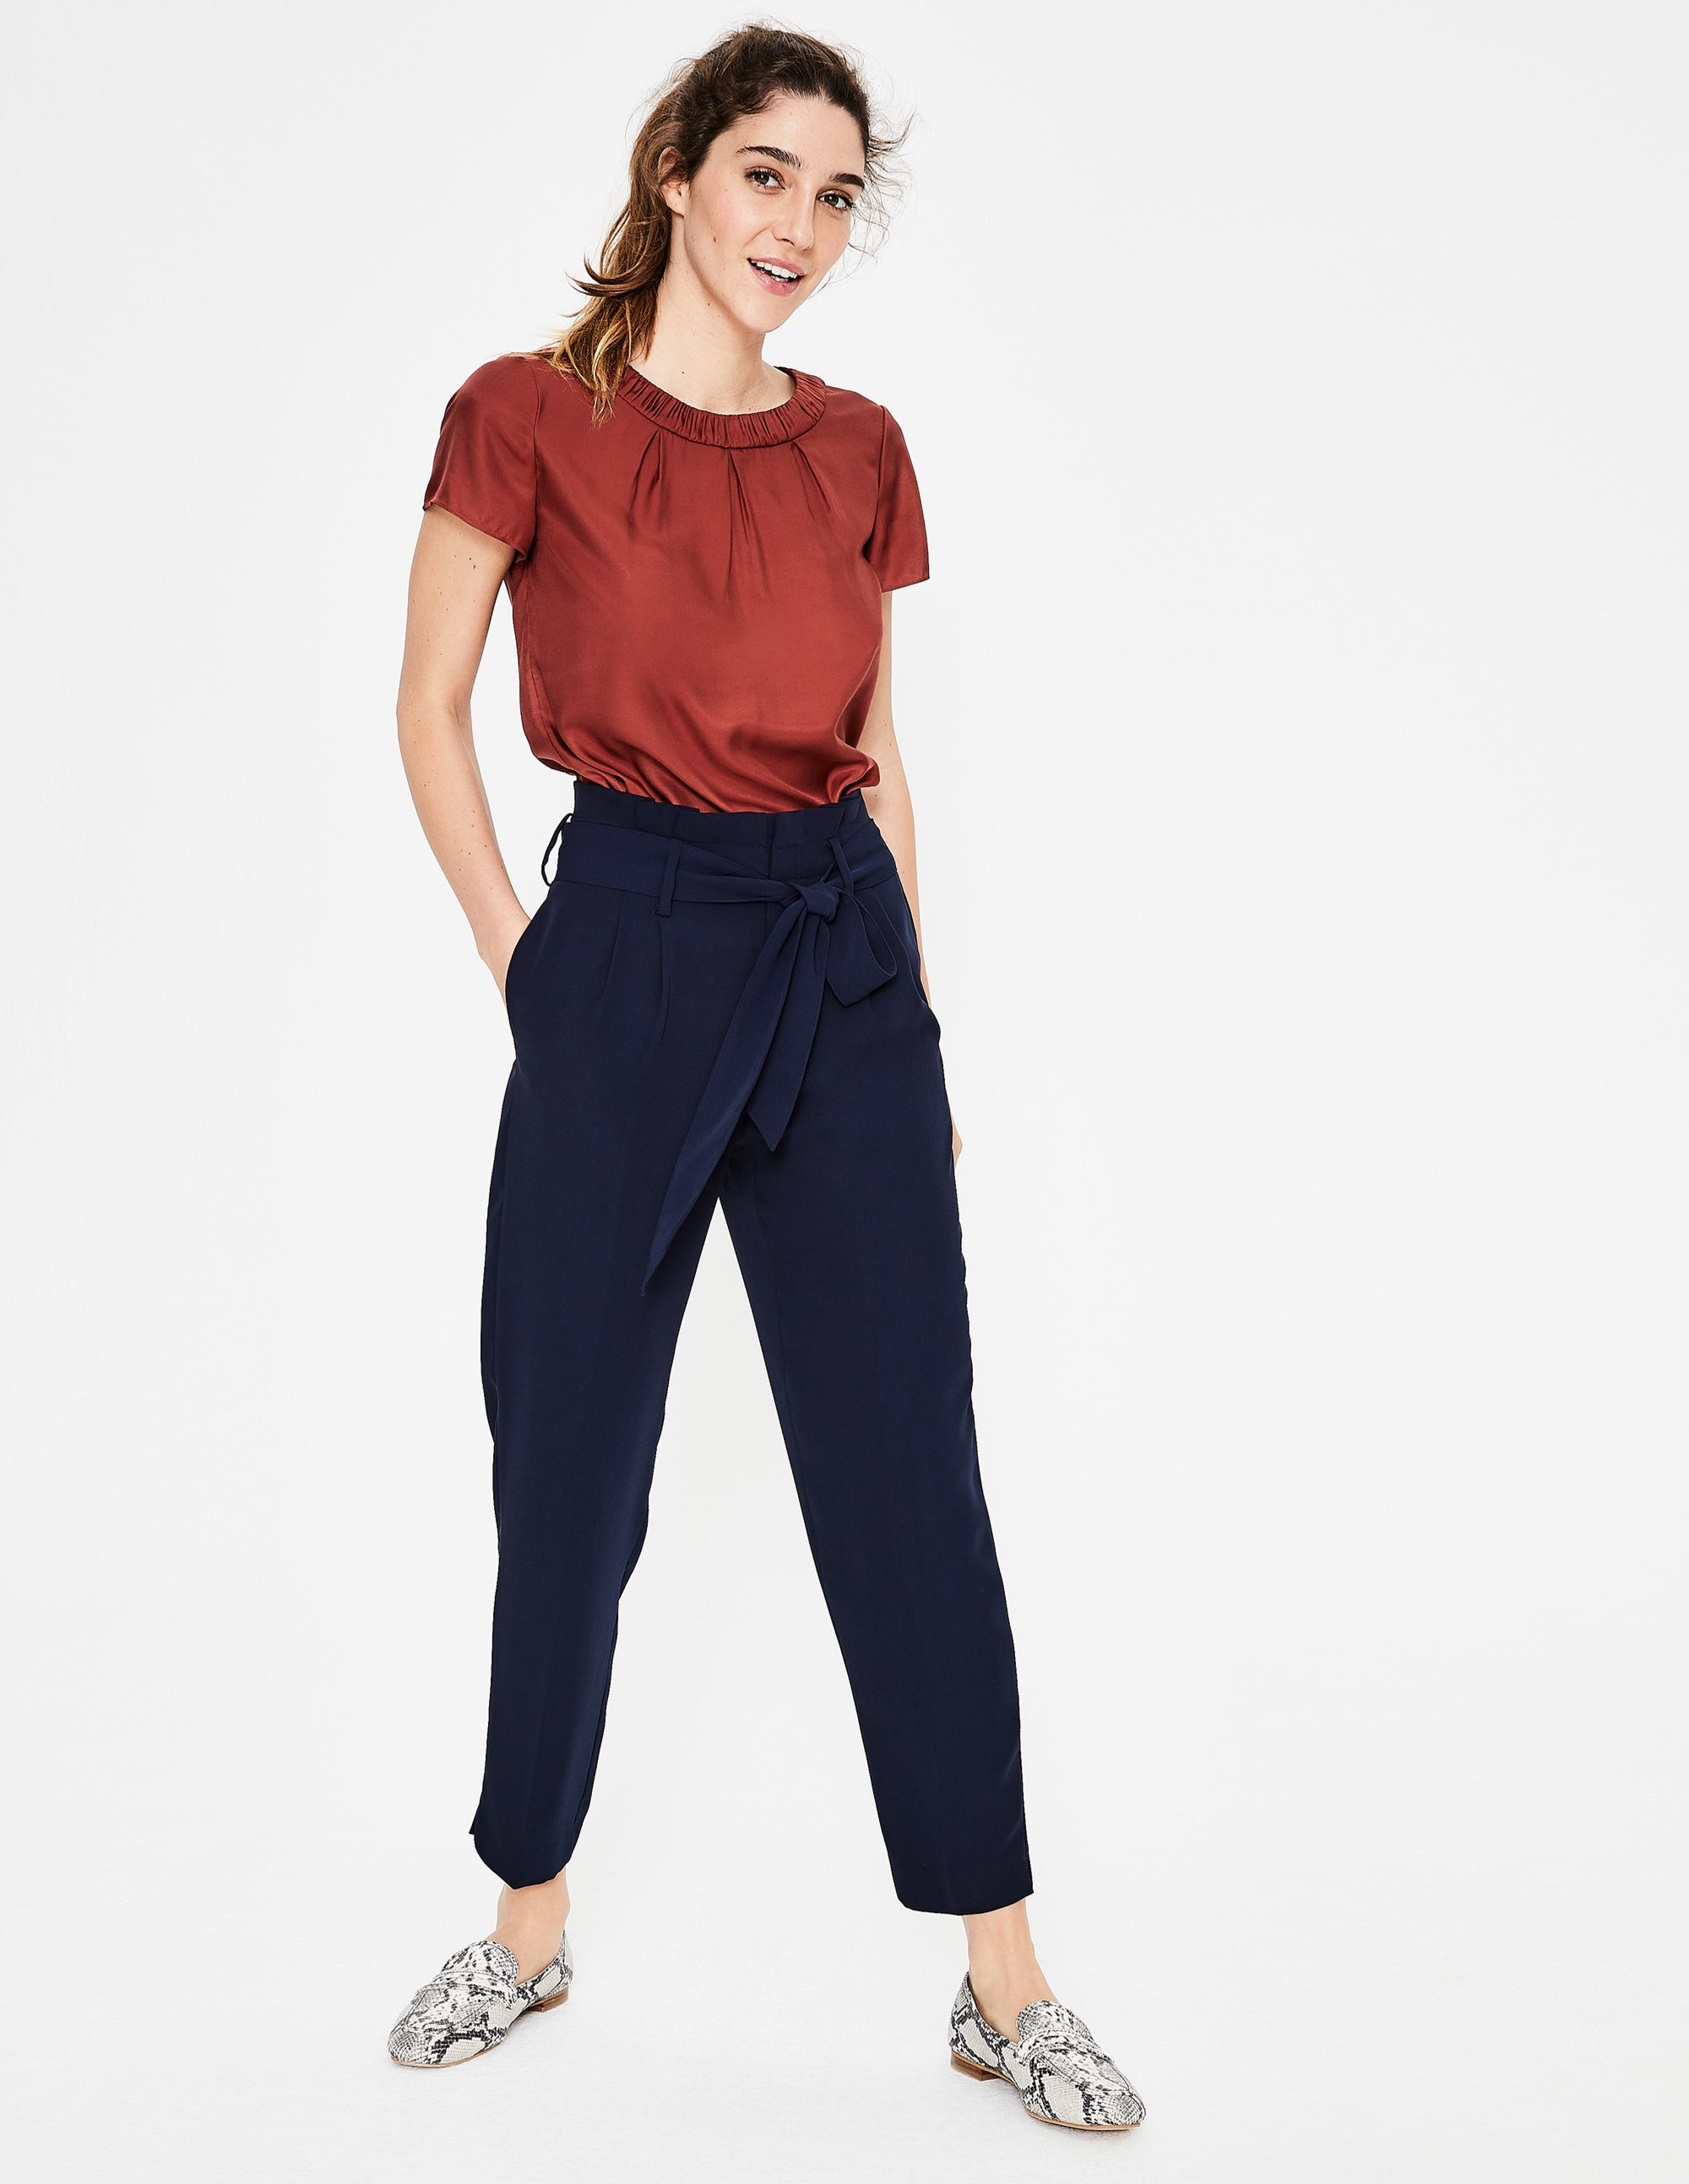 Boden Melina Paperbag Pants - Navy